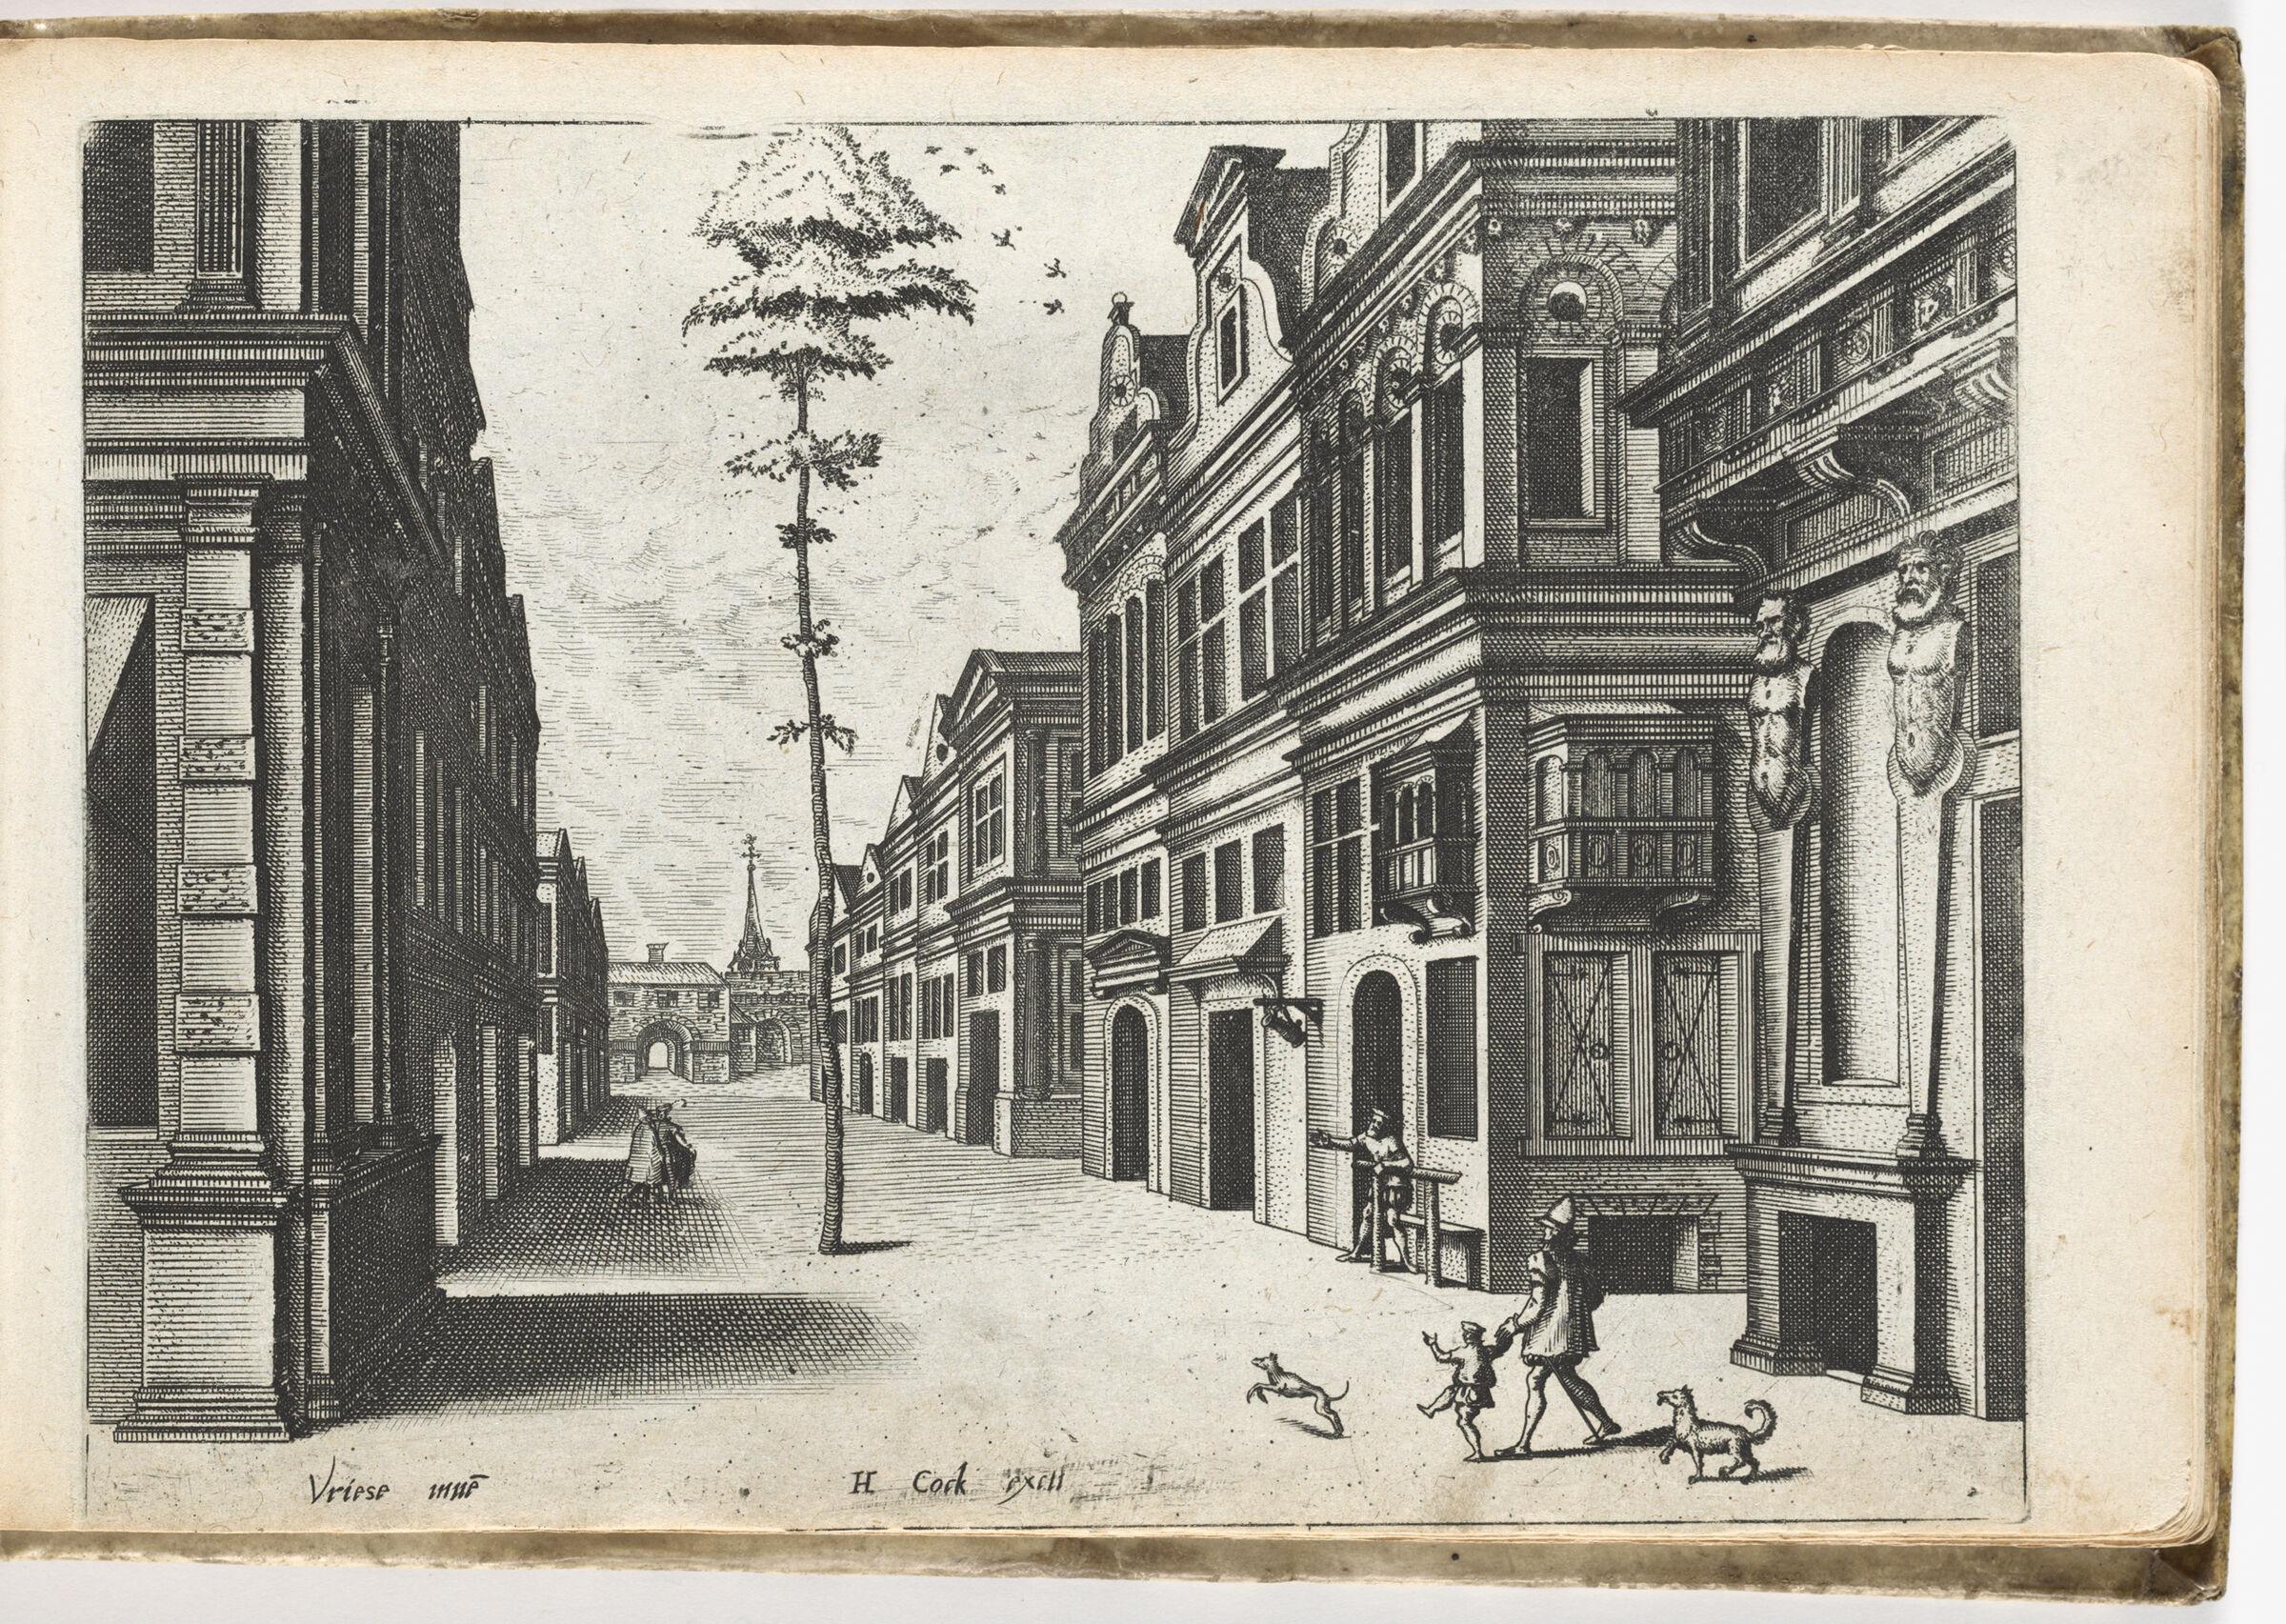 City Street With Lone Tree